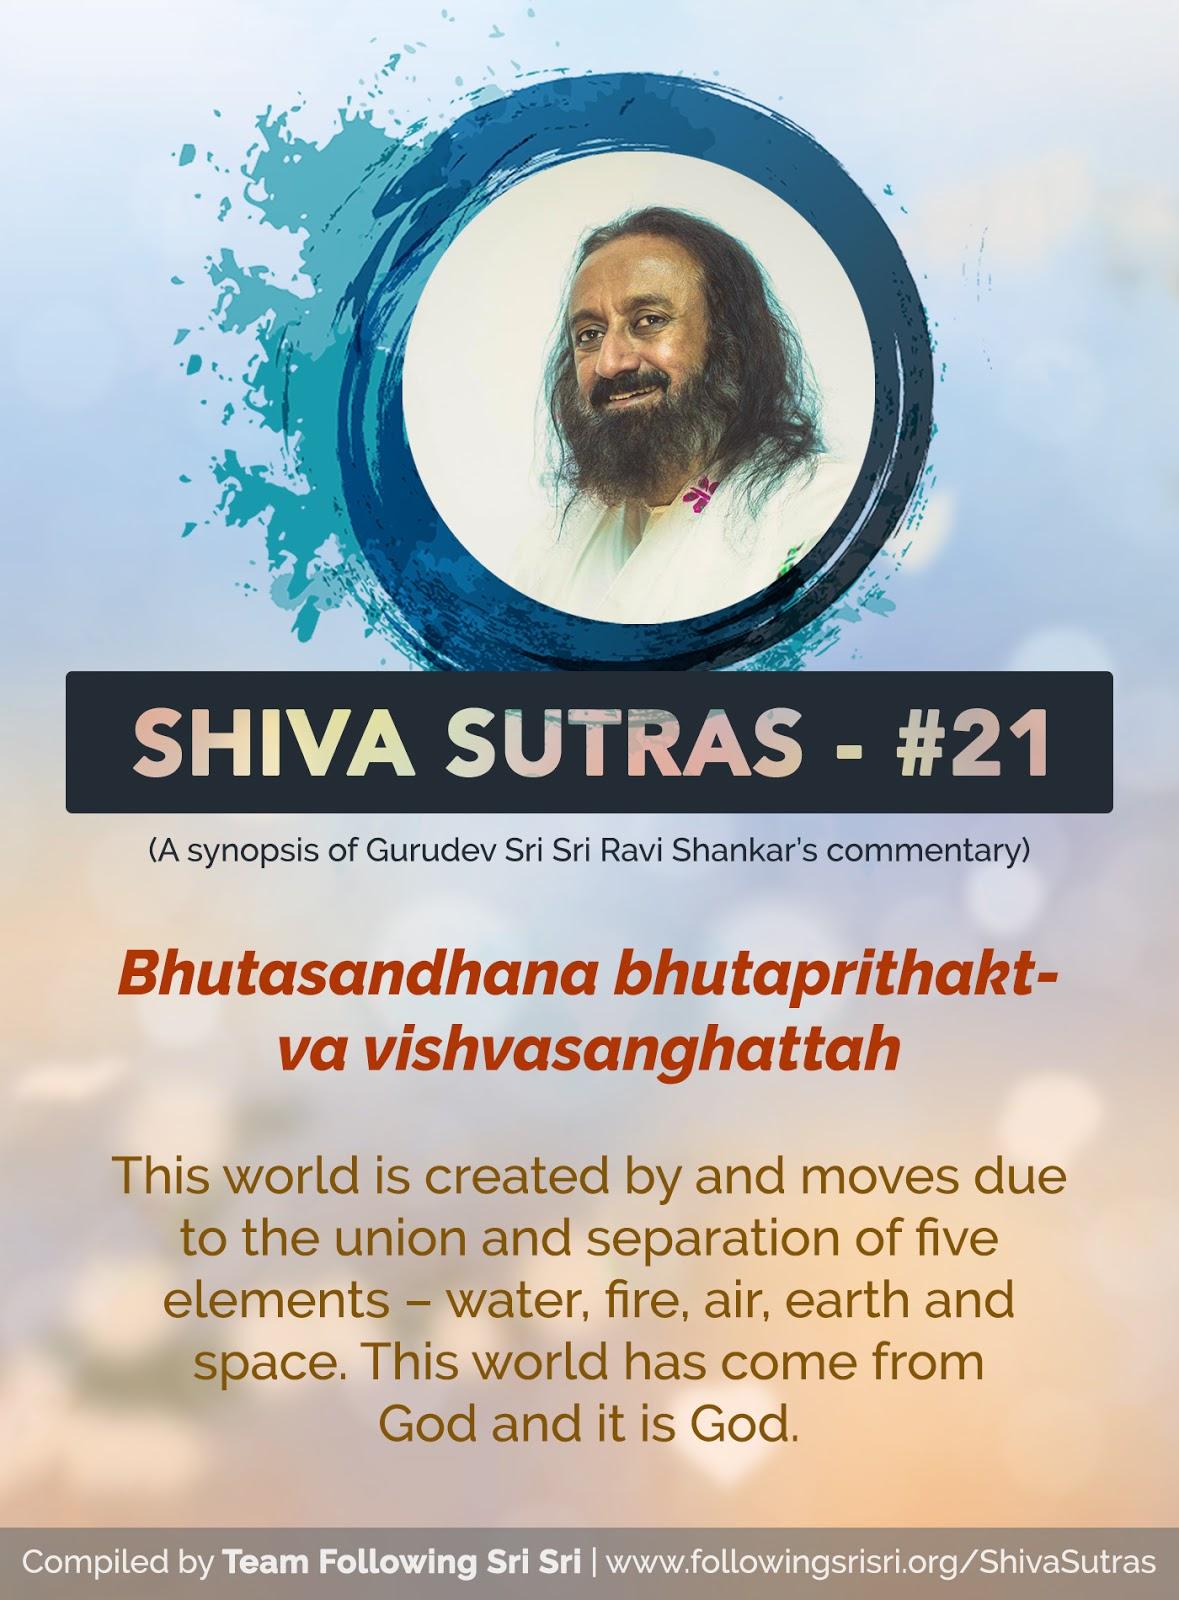 Shiva Sutras - Sutra 21